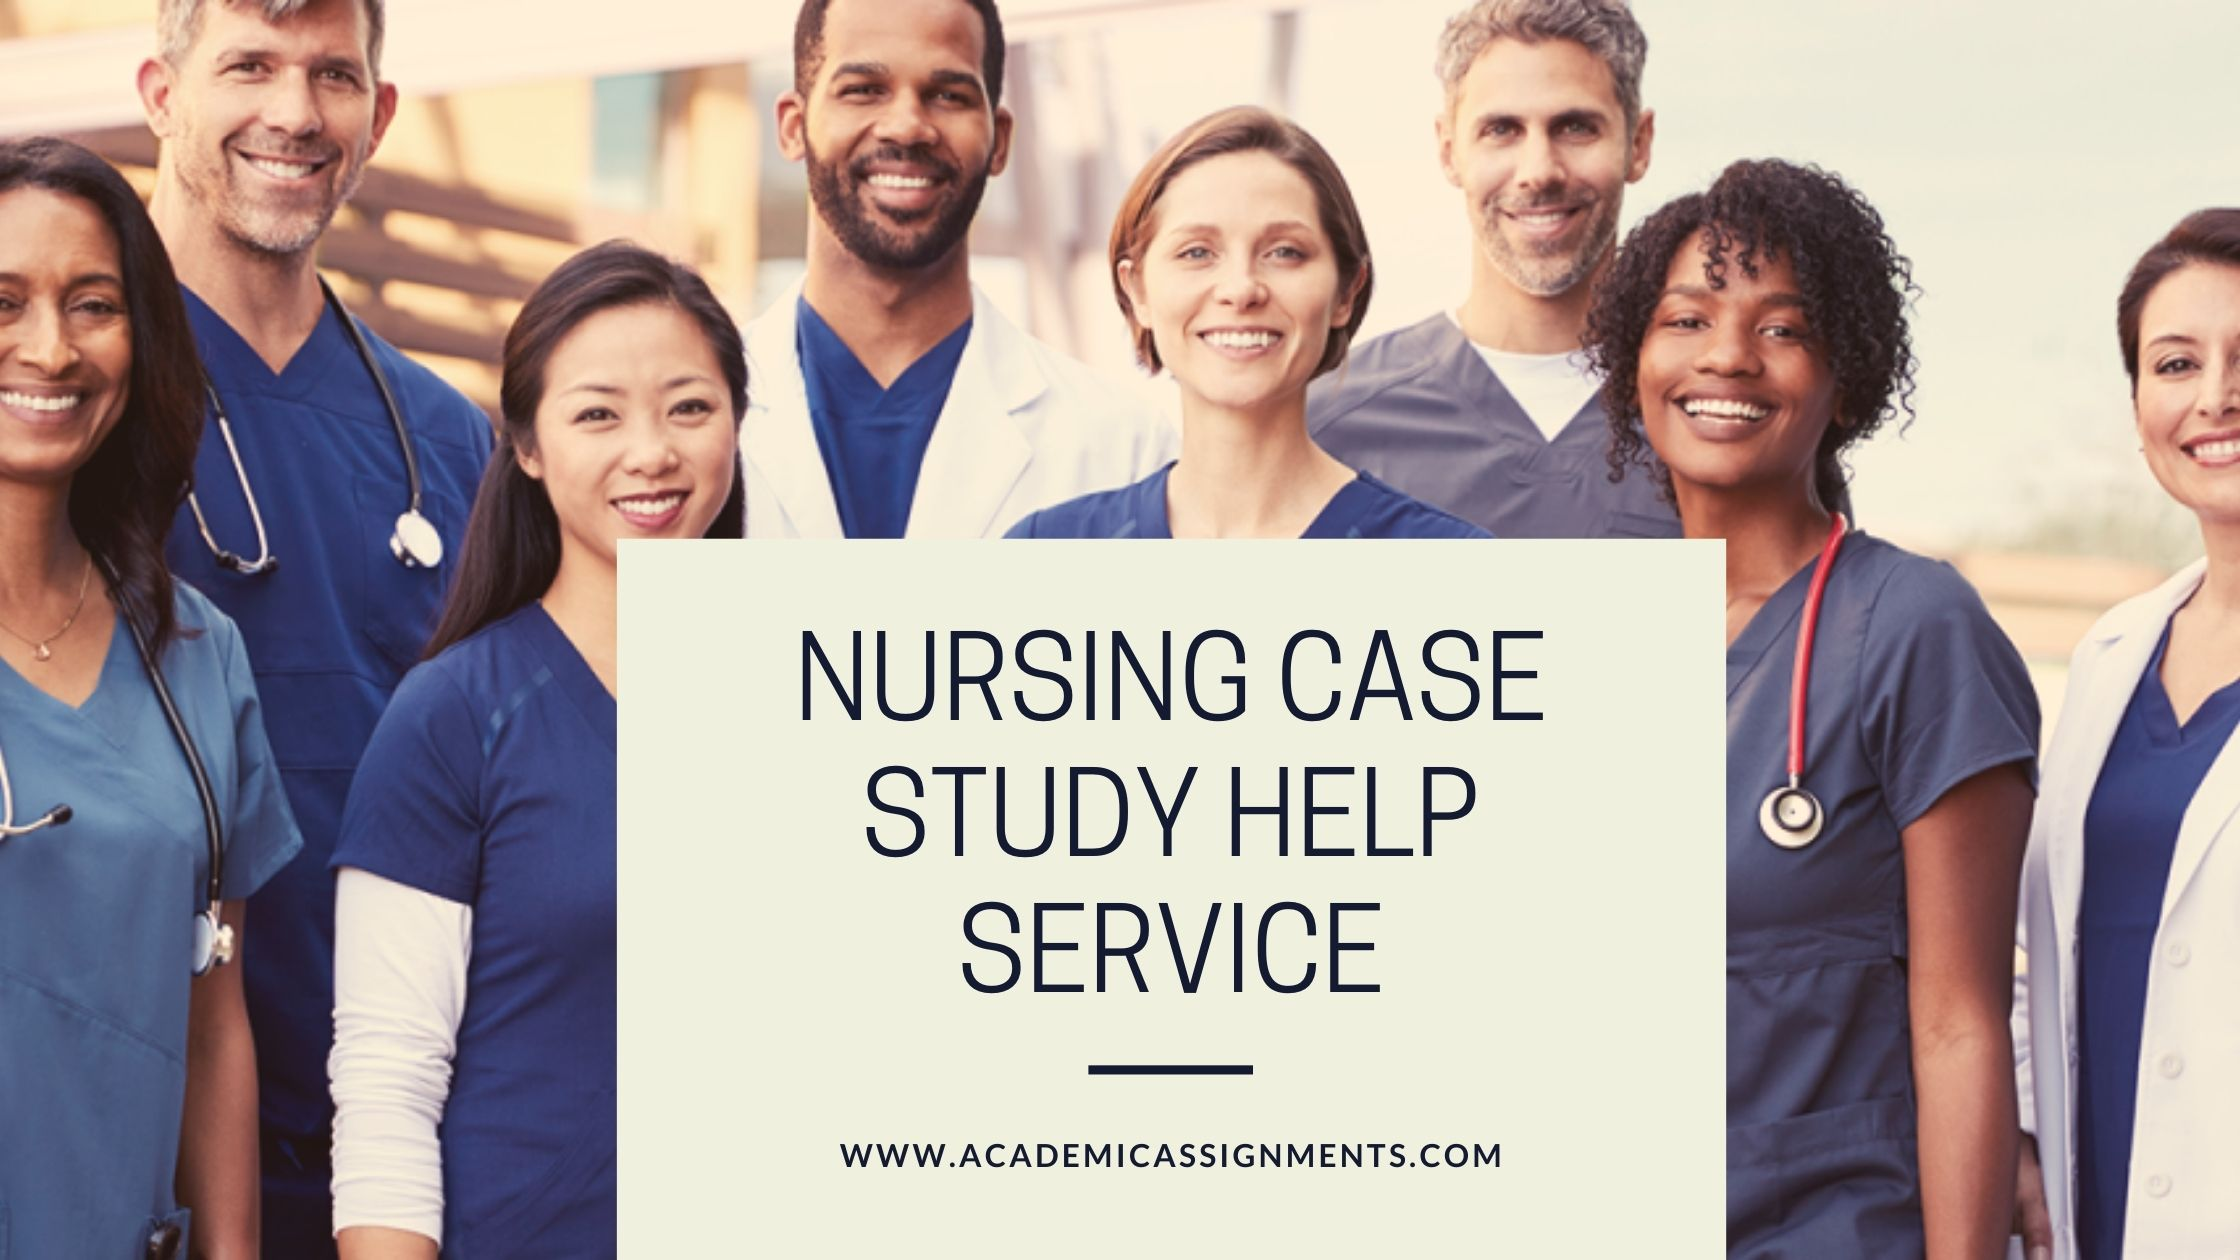 Nursing Case Study Help Service